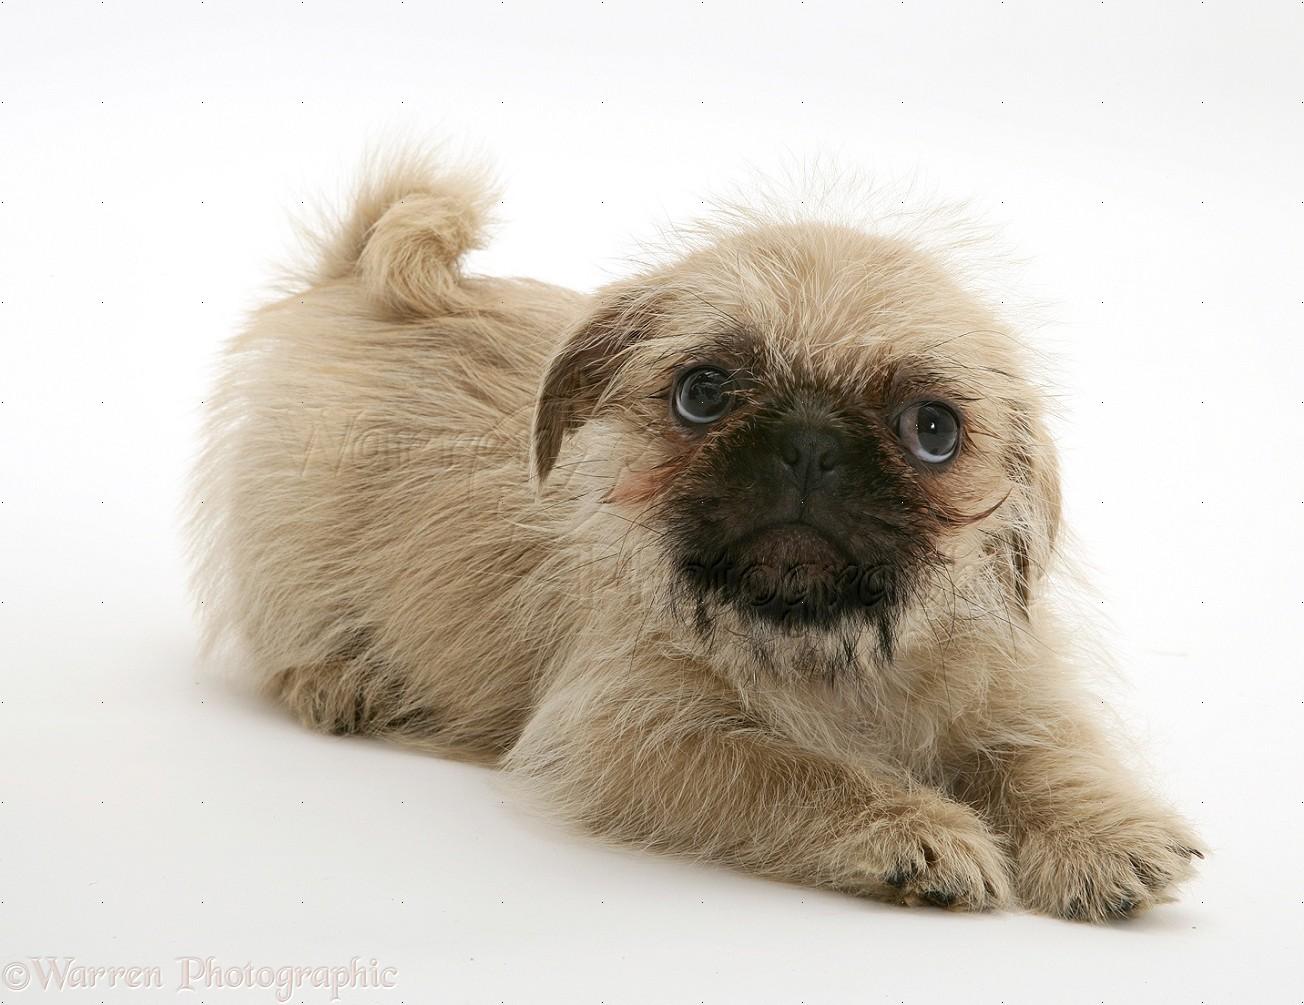 Dog: Pugzu (Pug x Shih-Tzu) pup photo - WP11653